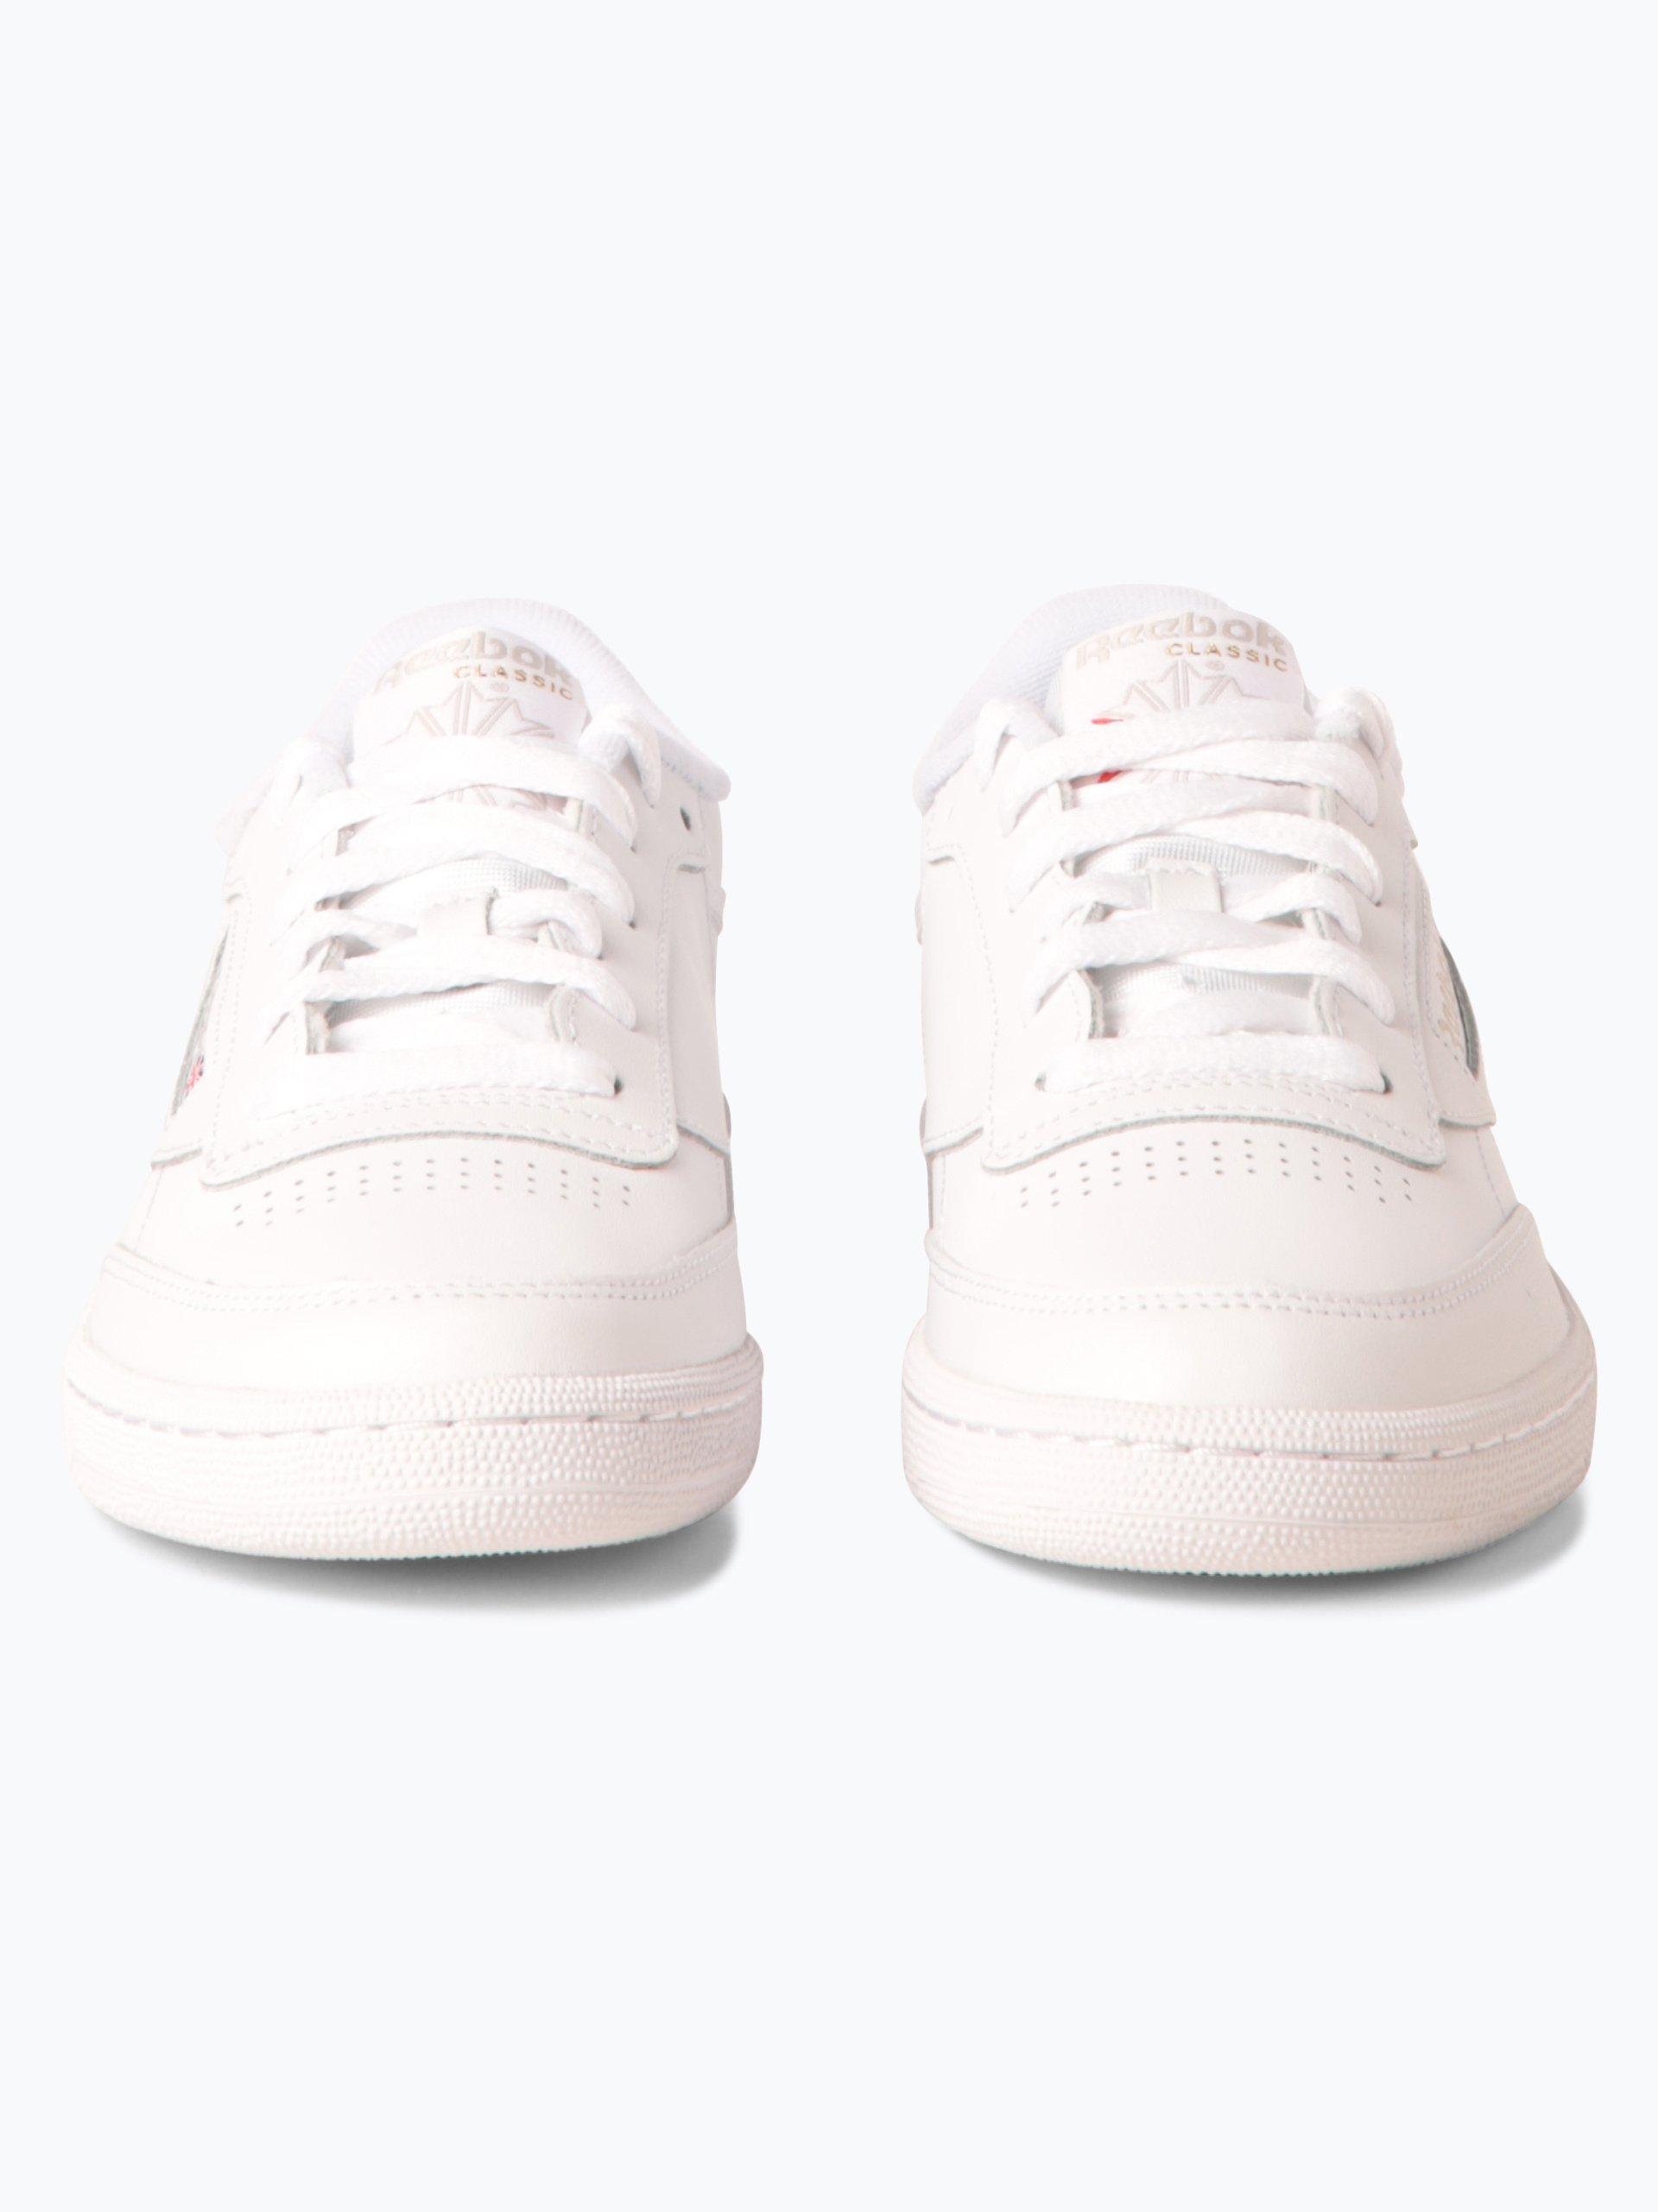 reebok damen sneaker aus leder wei uni online kaufen. Black Bedroom Furniture Sets. Home Design Ideas